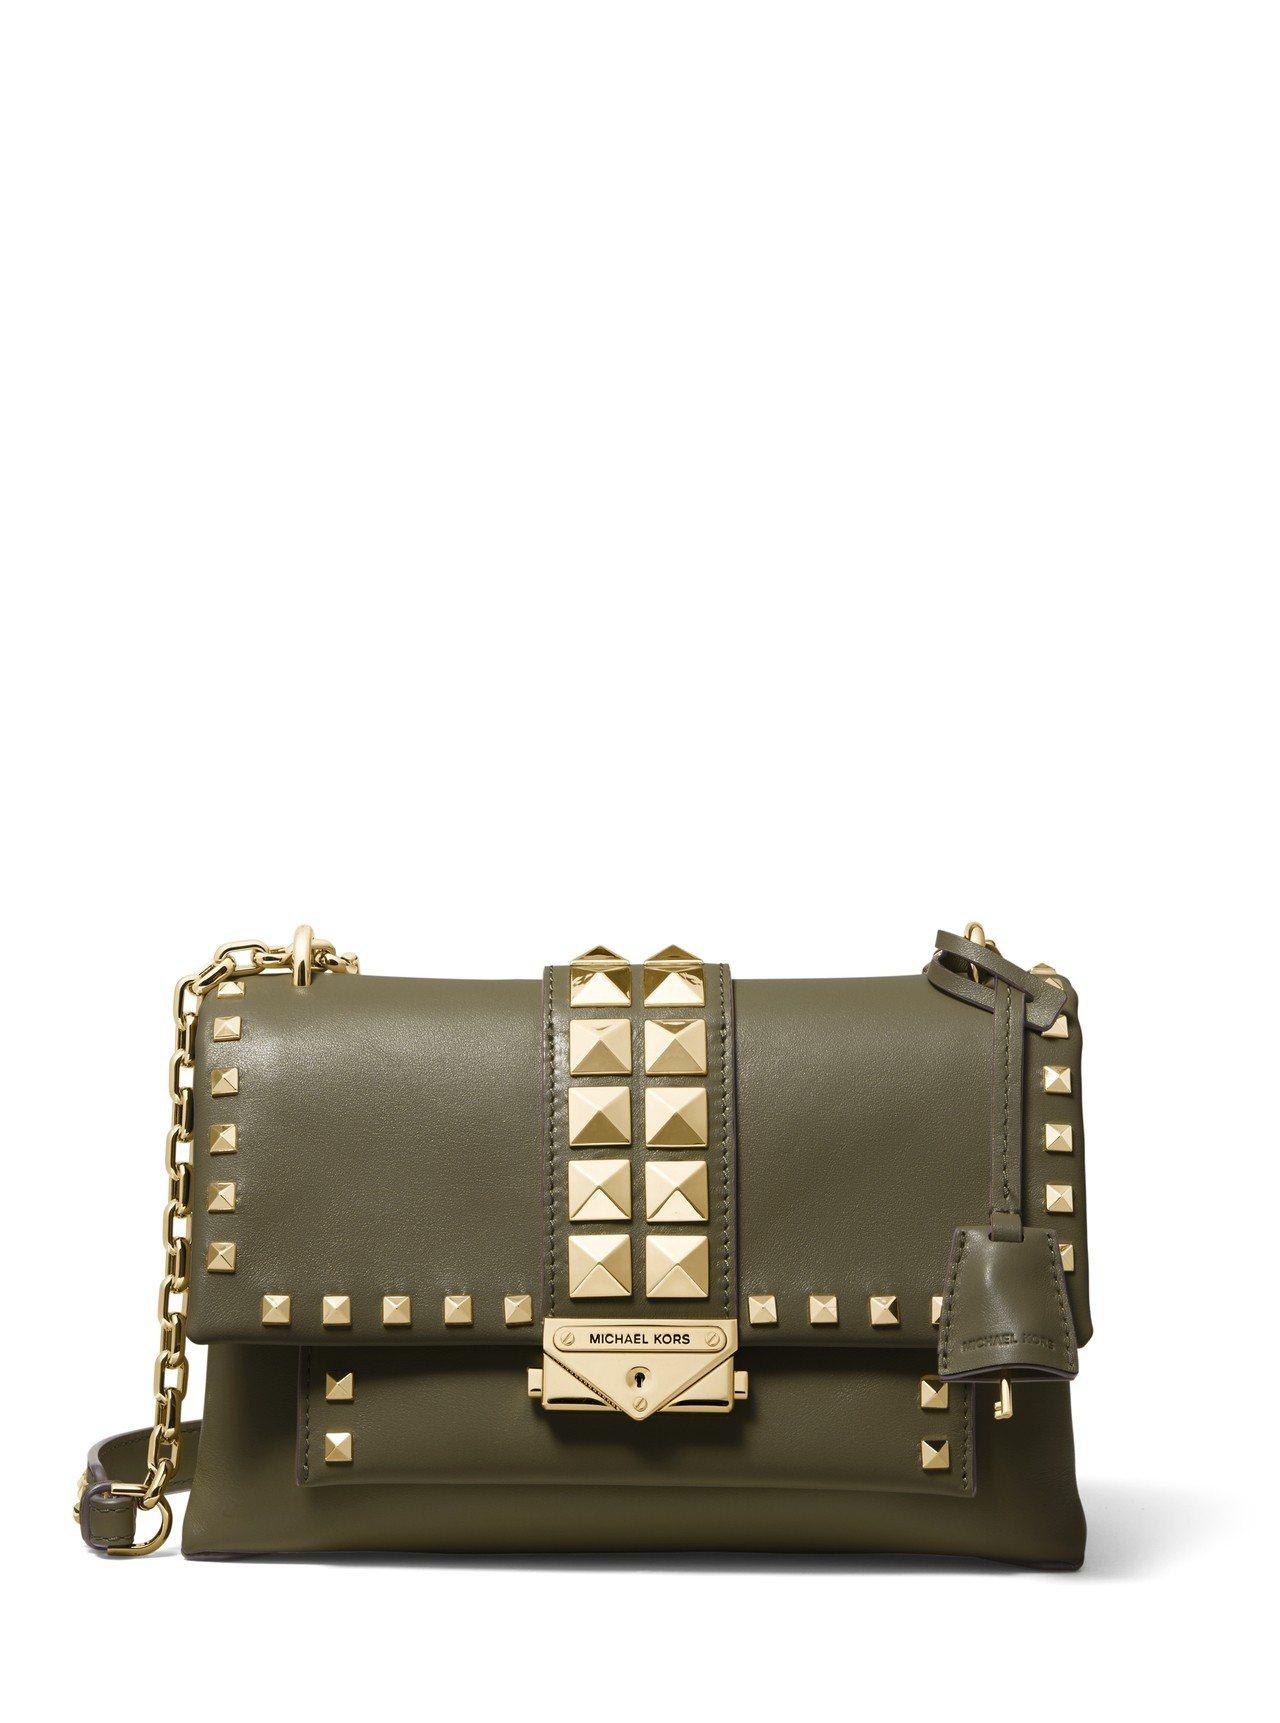 CECE鉚釘牛皮橄欖綠單肩鍊帶包,售價22,500元。圖/MICHAEL KOR...